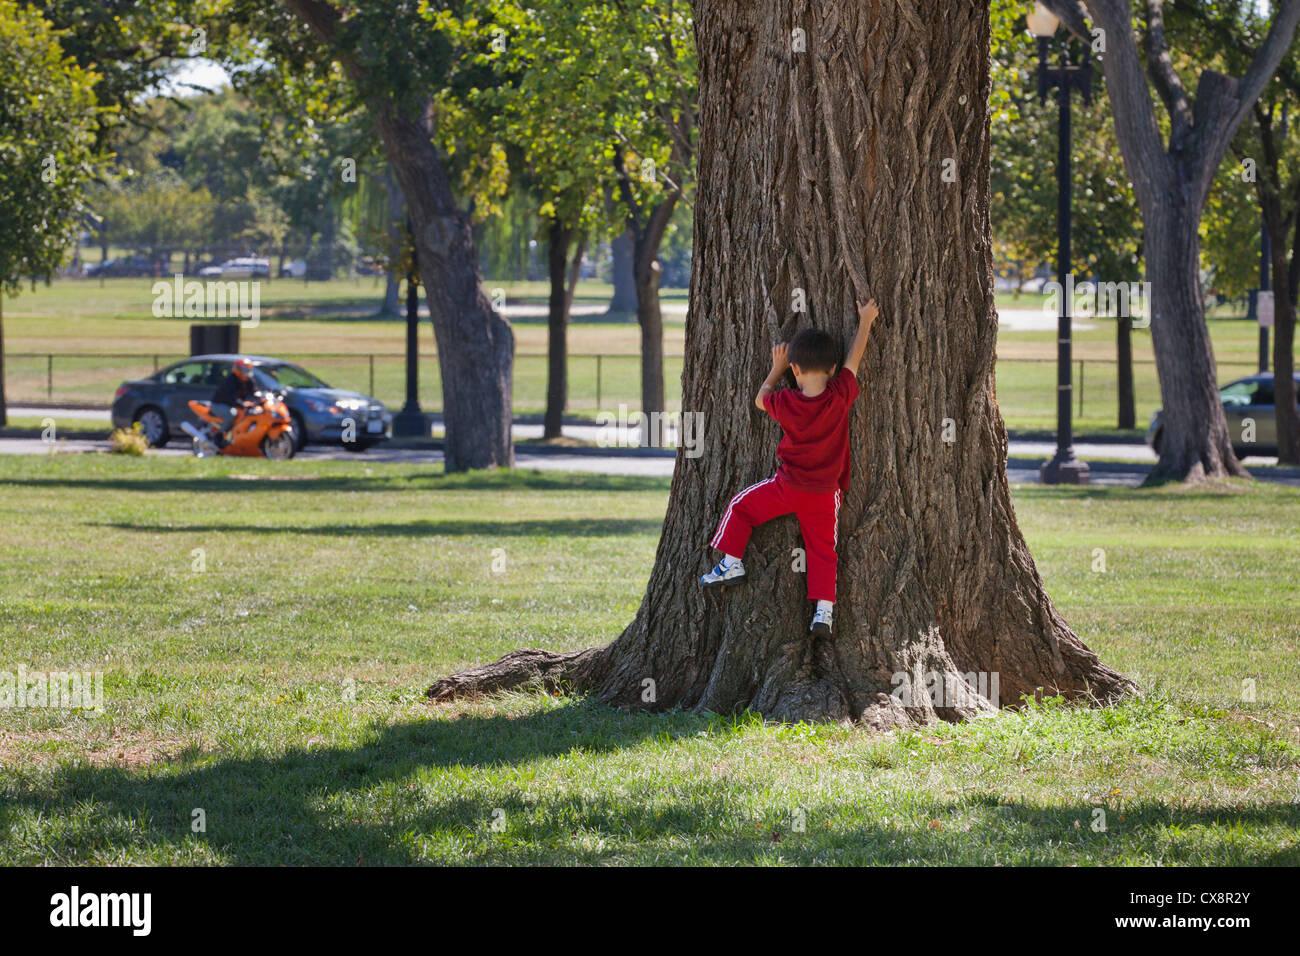 Boy climbing a large tree trunk - Stock Image